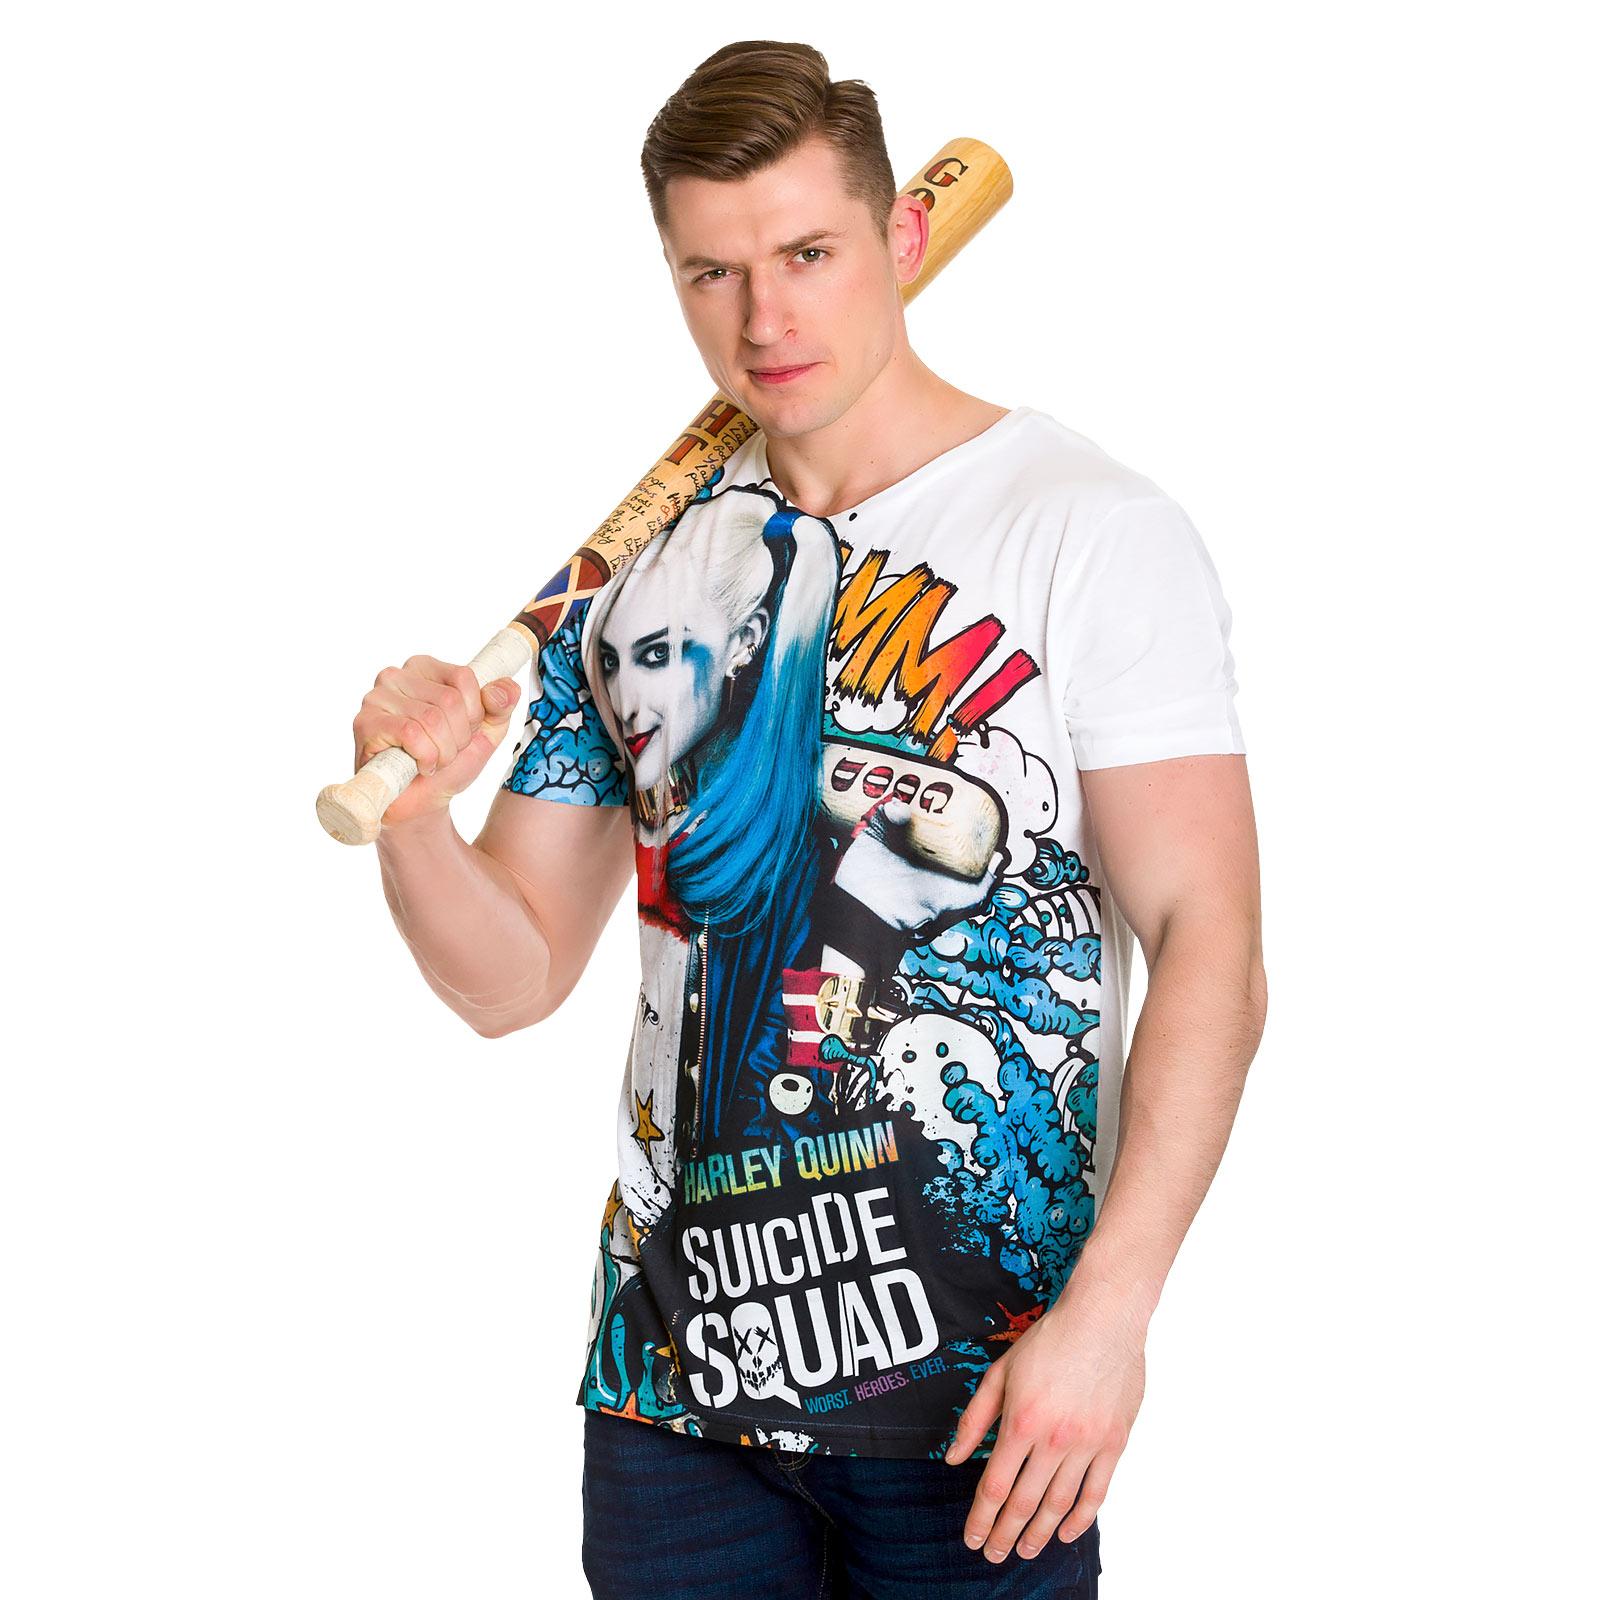 Suicide Squad - Harley Quinn Graffiti Full Size T-Shirt